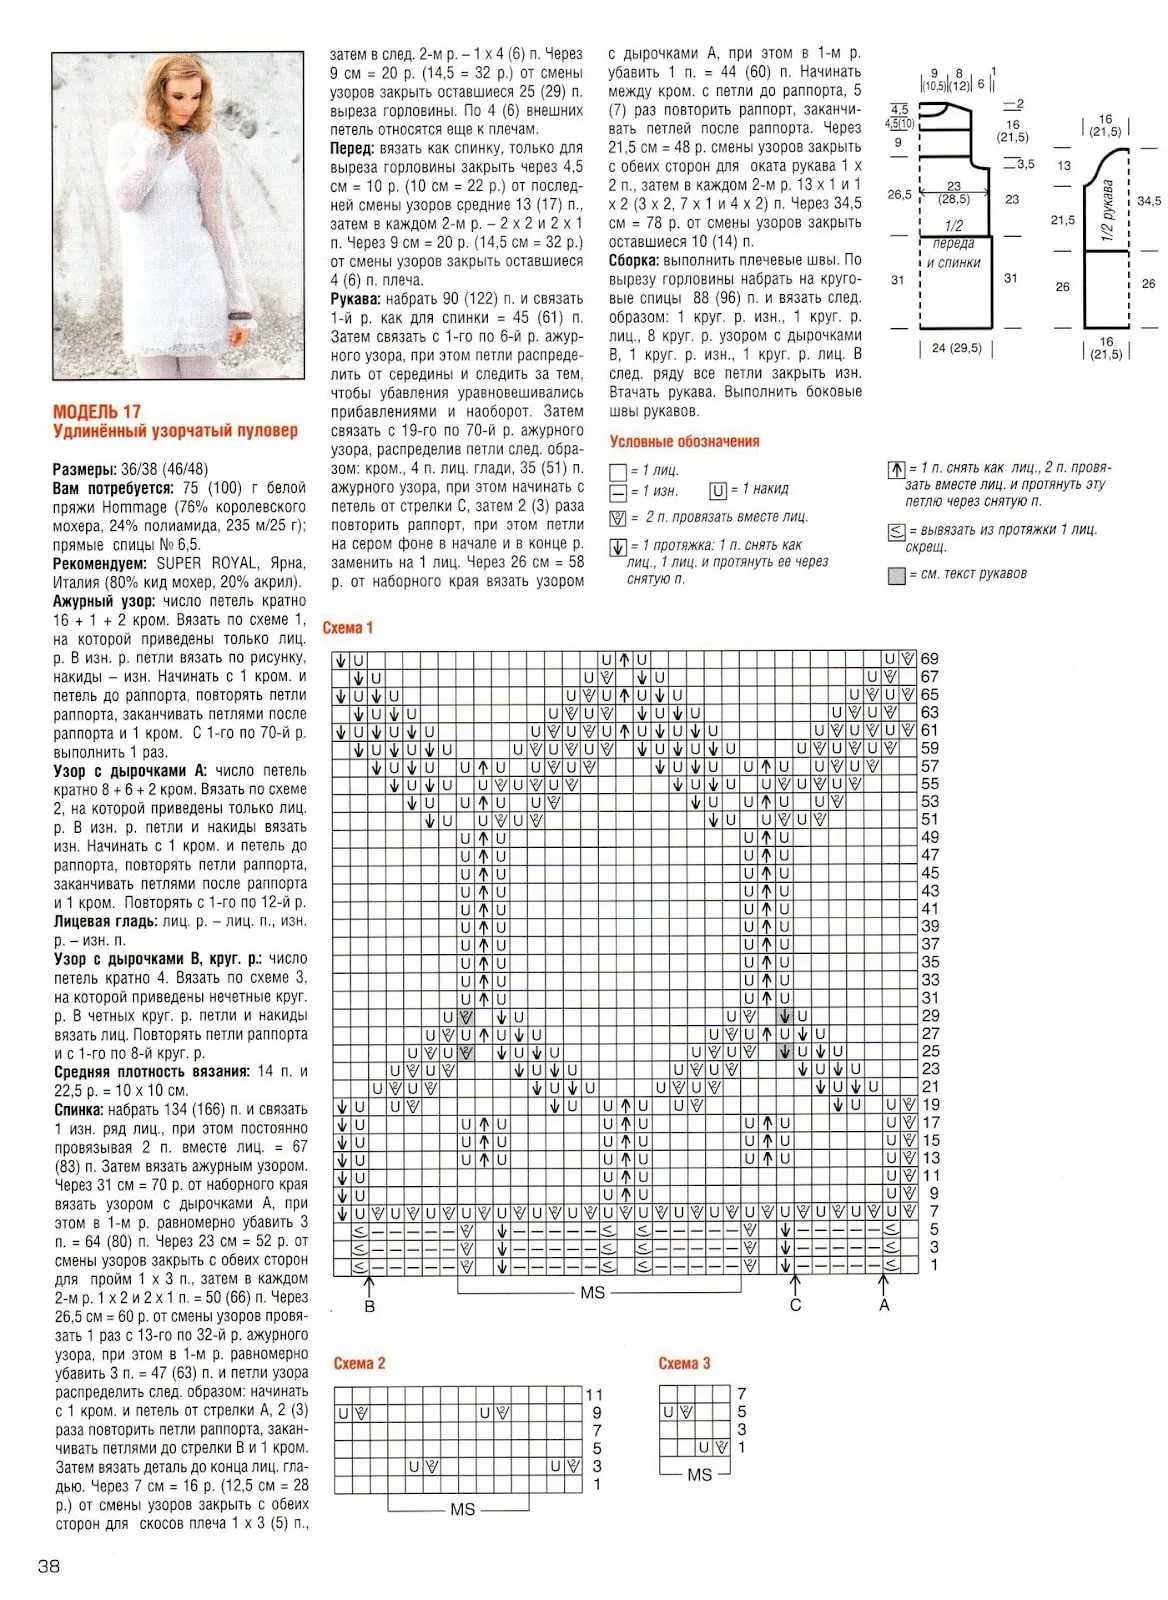 Схемы вязания кардигана из мохера спицами